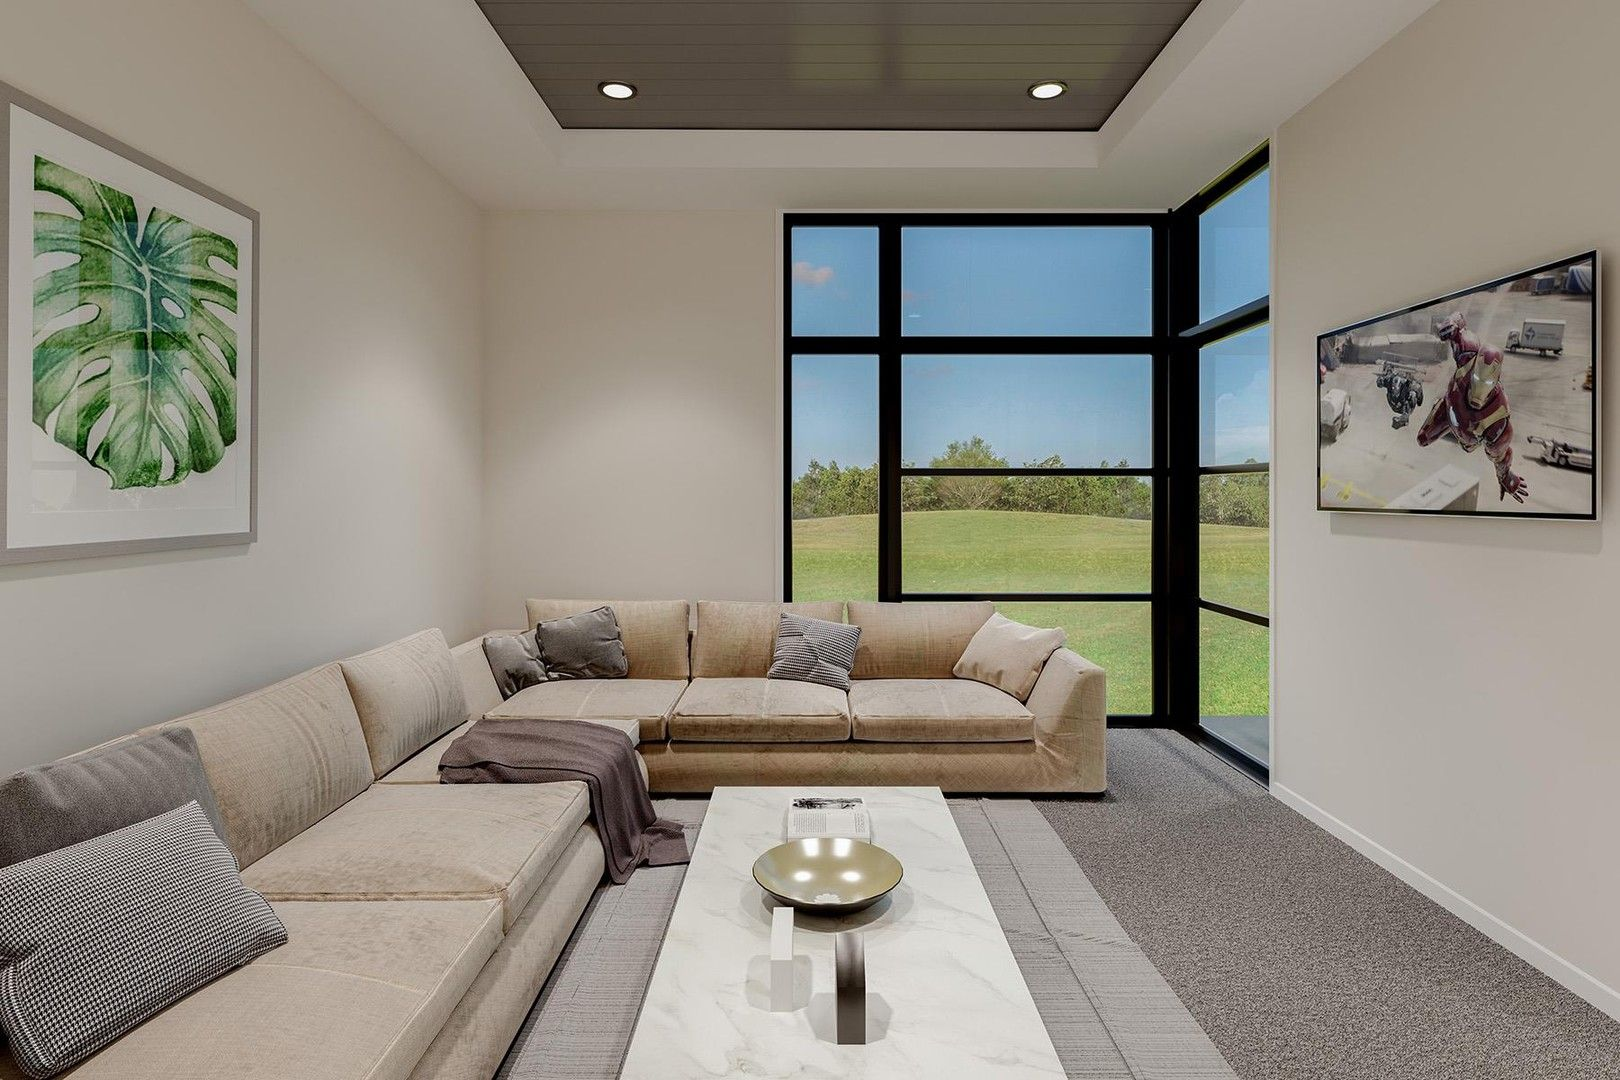 Lot 230 Wandsworth Street, Cranley QLD 4350, Image 1